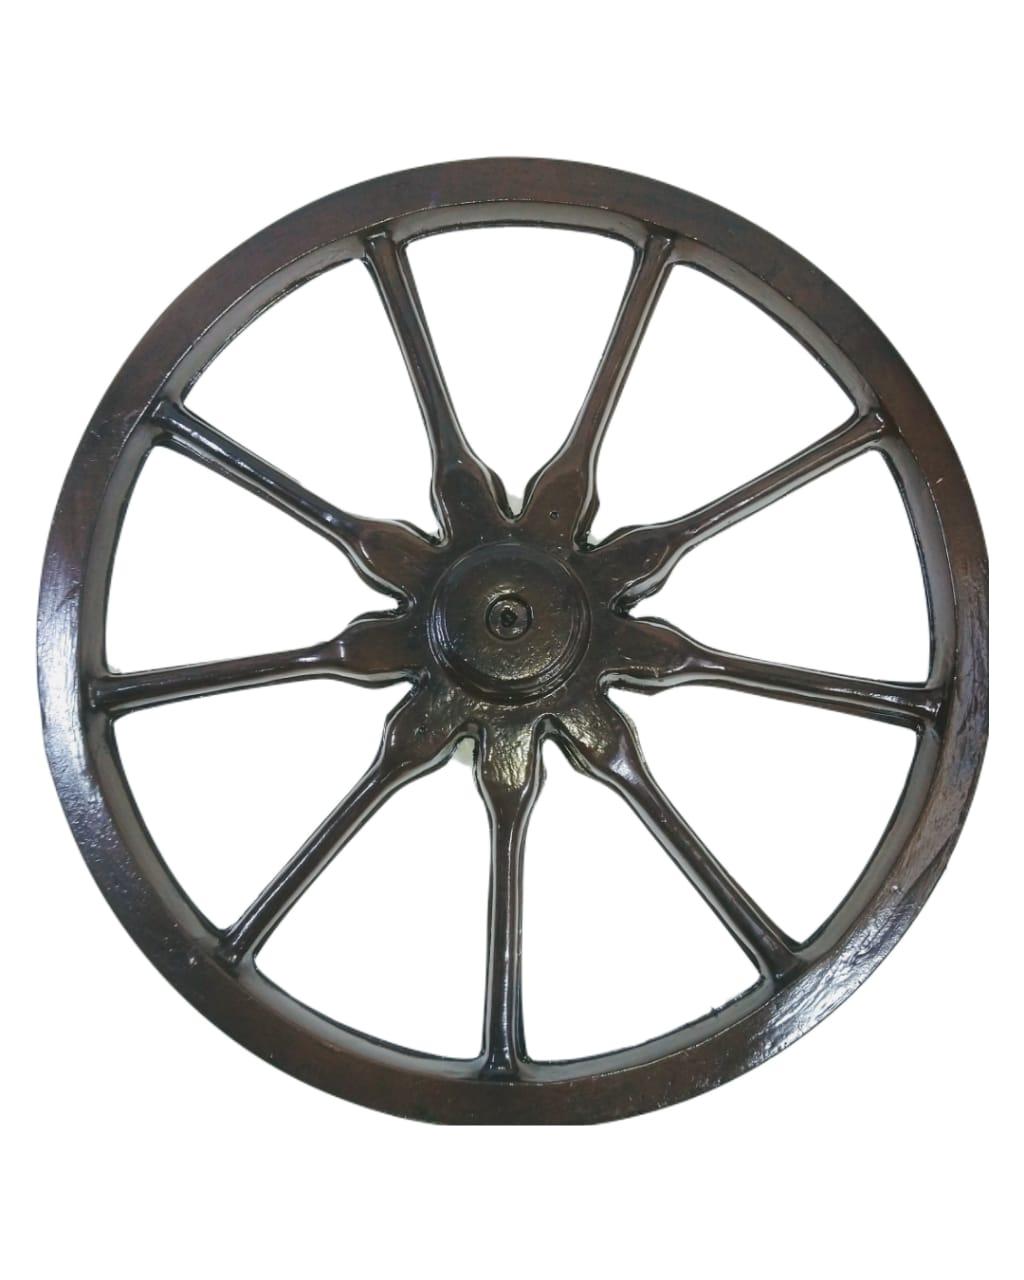 Roda de Carroça P de Plástico